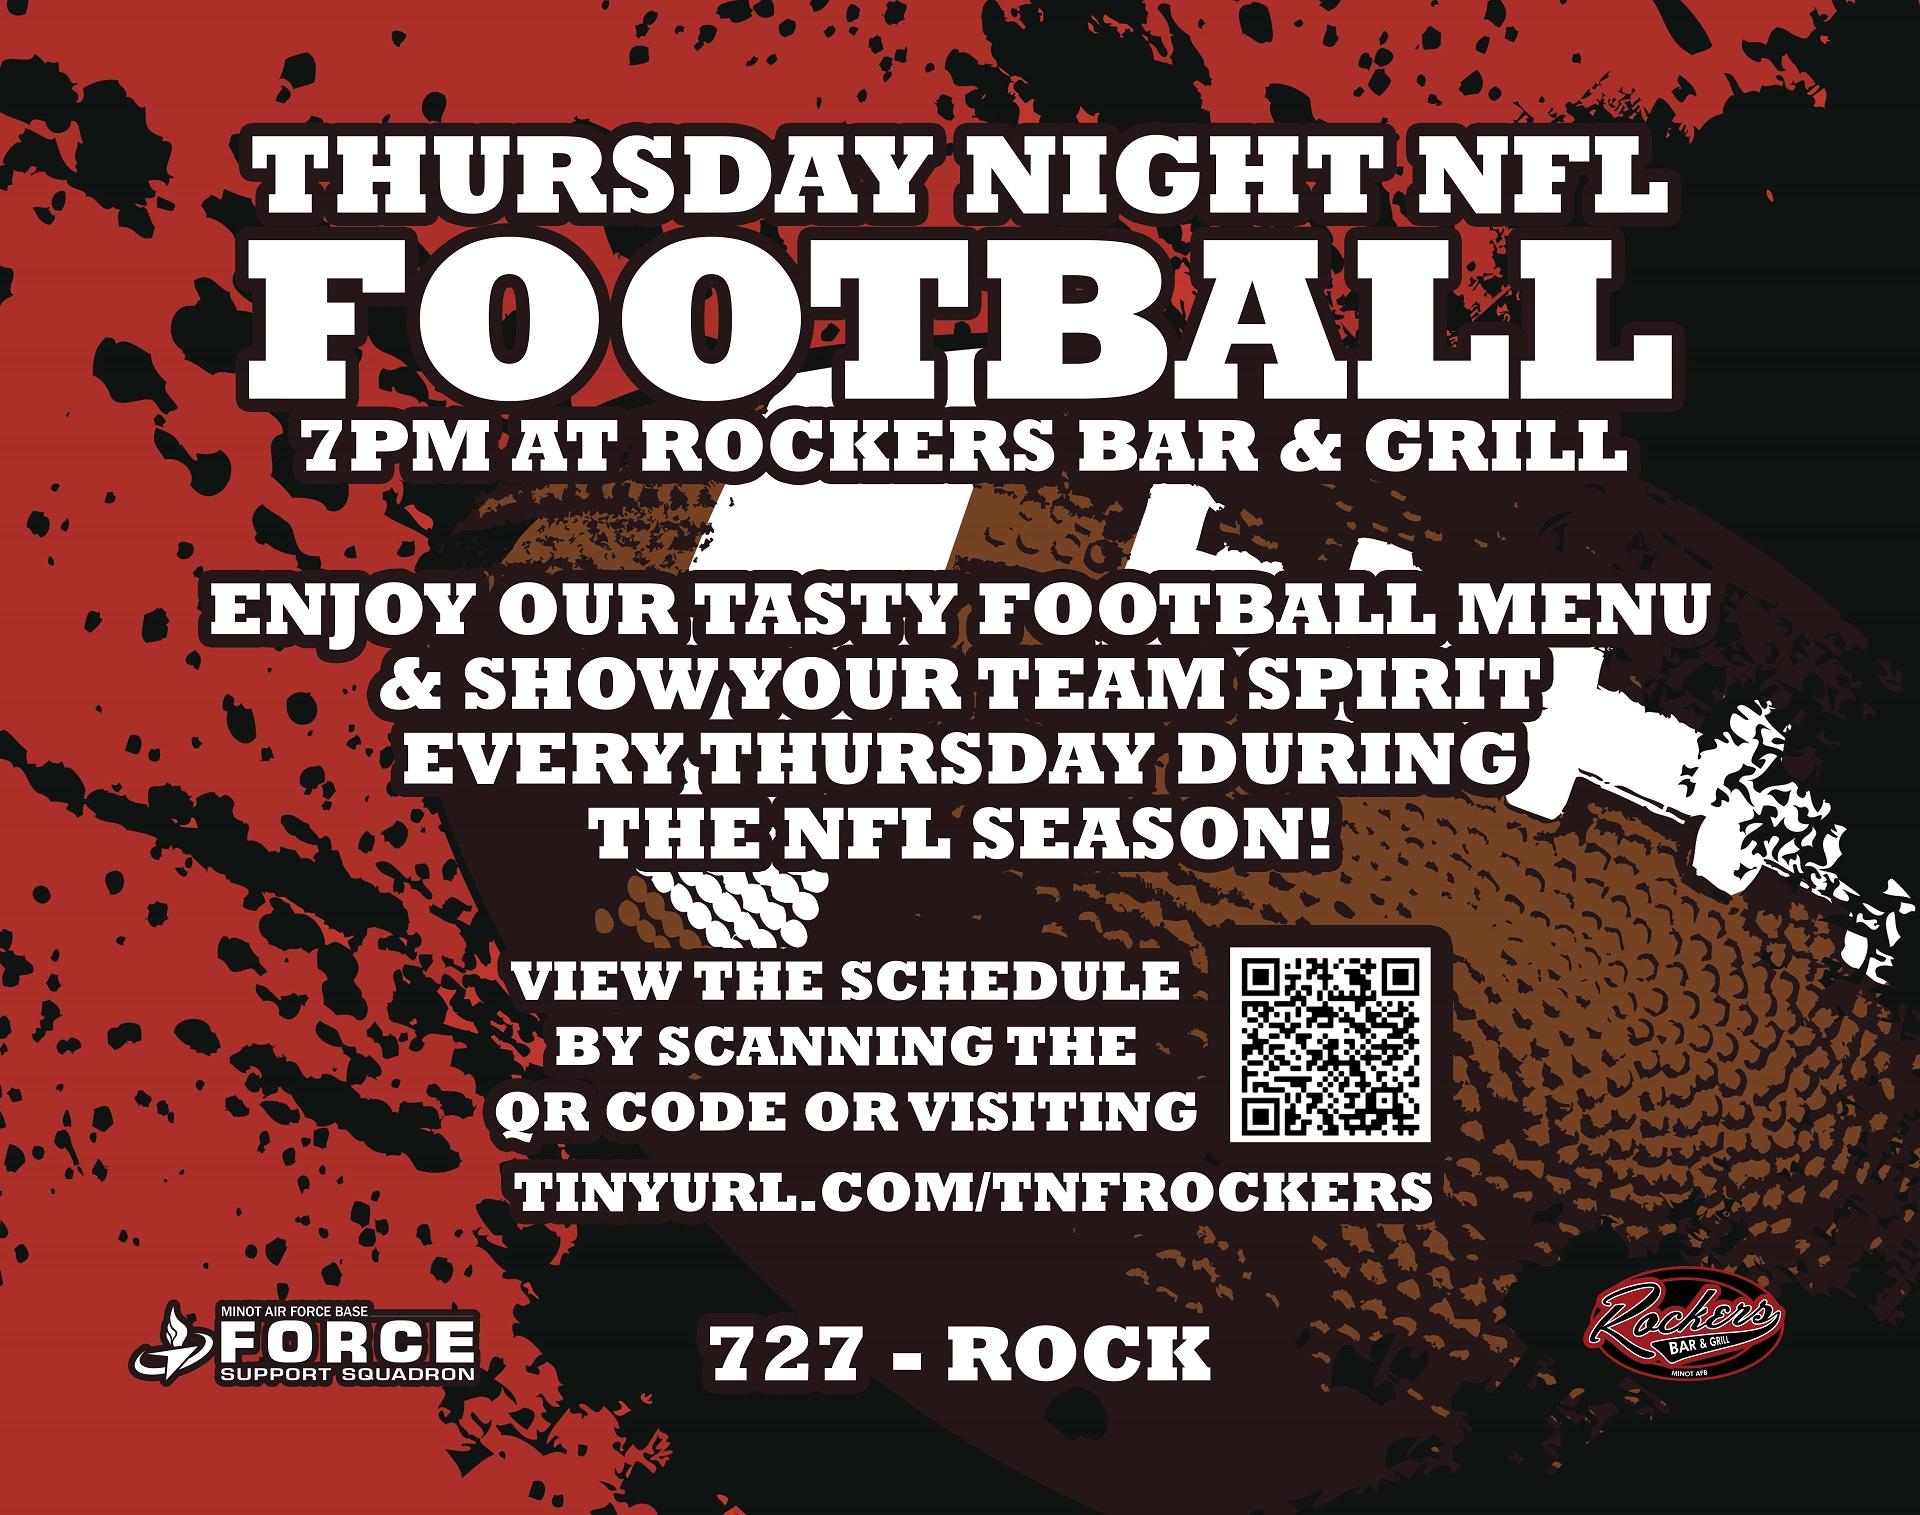 Thursday Night Football - SEP 21